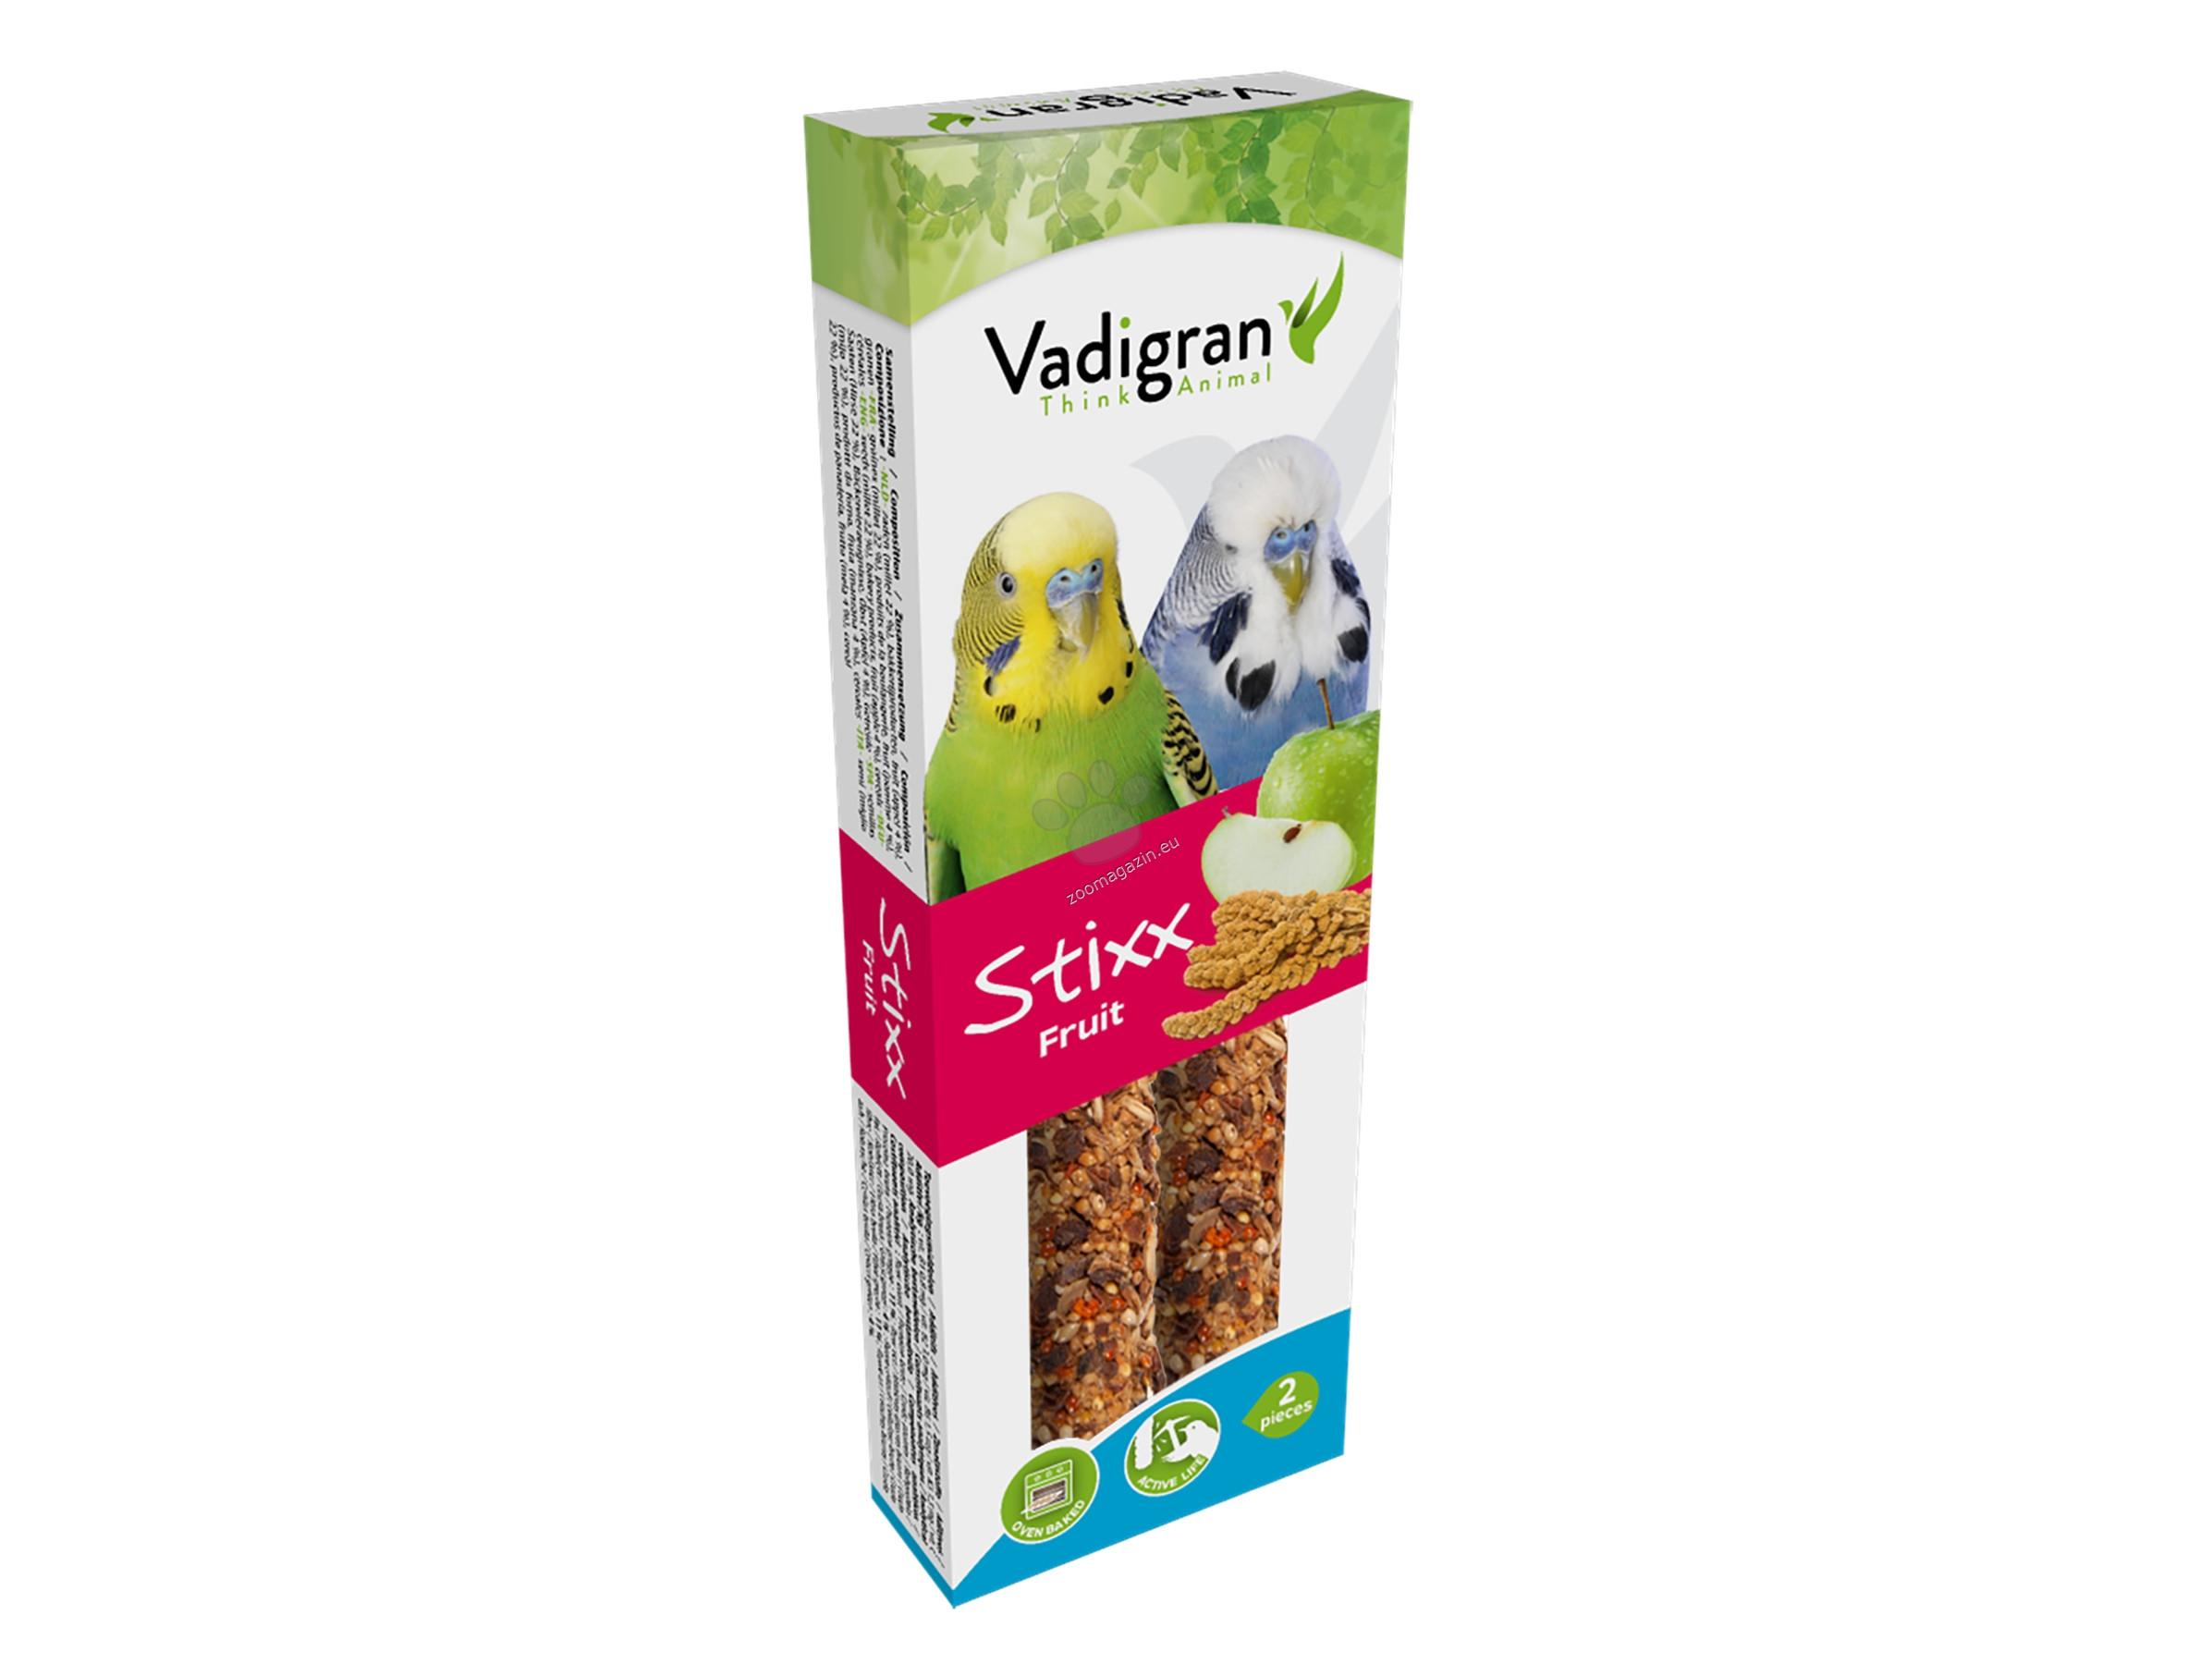 Vadigran Stixx Fruit - крекер с плодове 2 бр. / 85 гр.